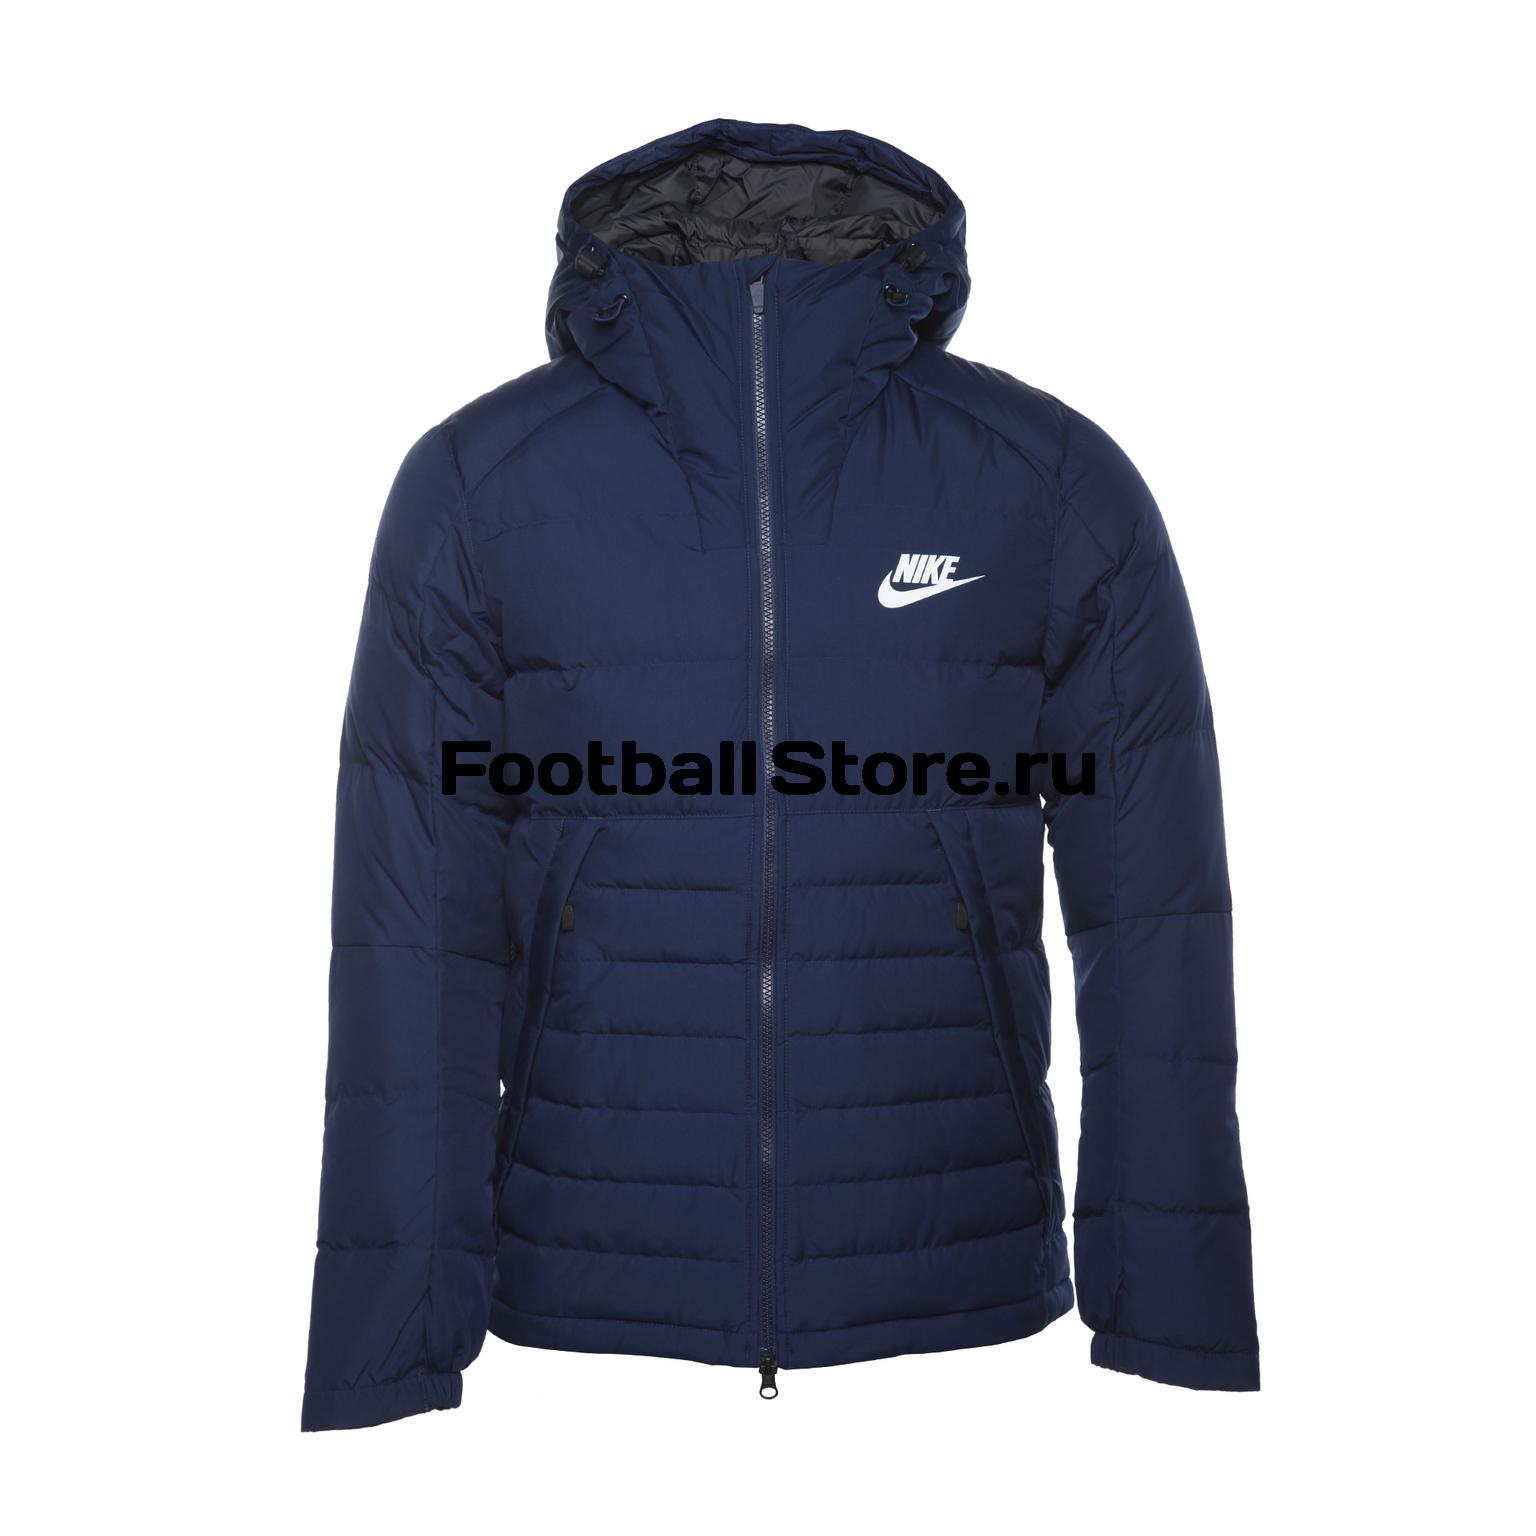 Куртки/Пуховики Nike Пуховик Nike Down Jacket 806855-429